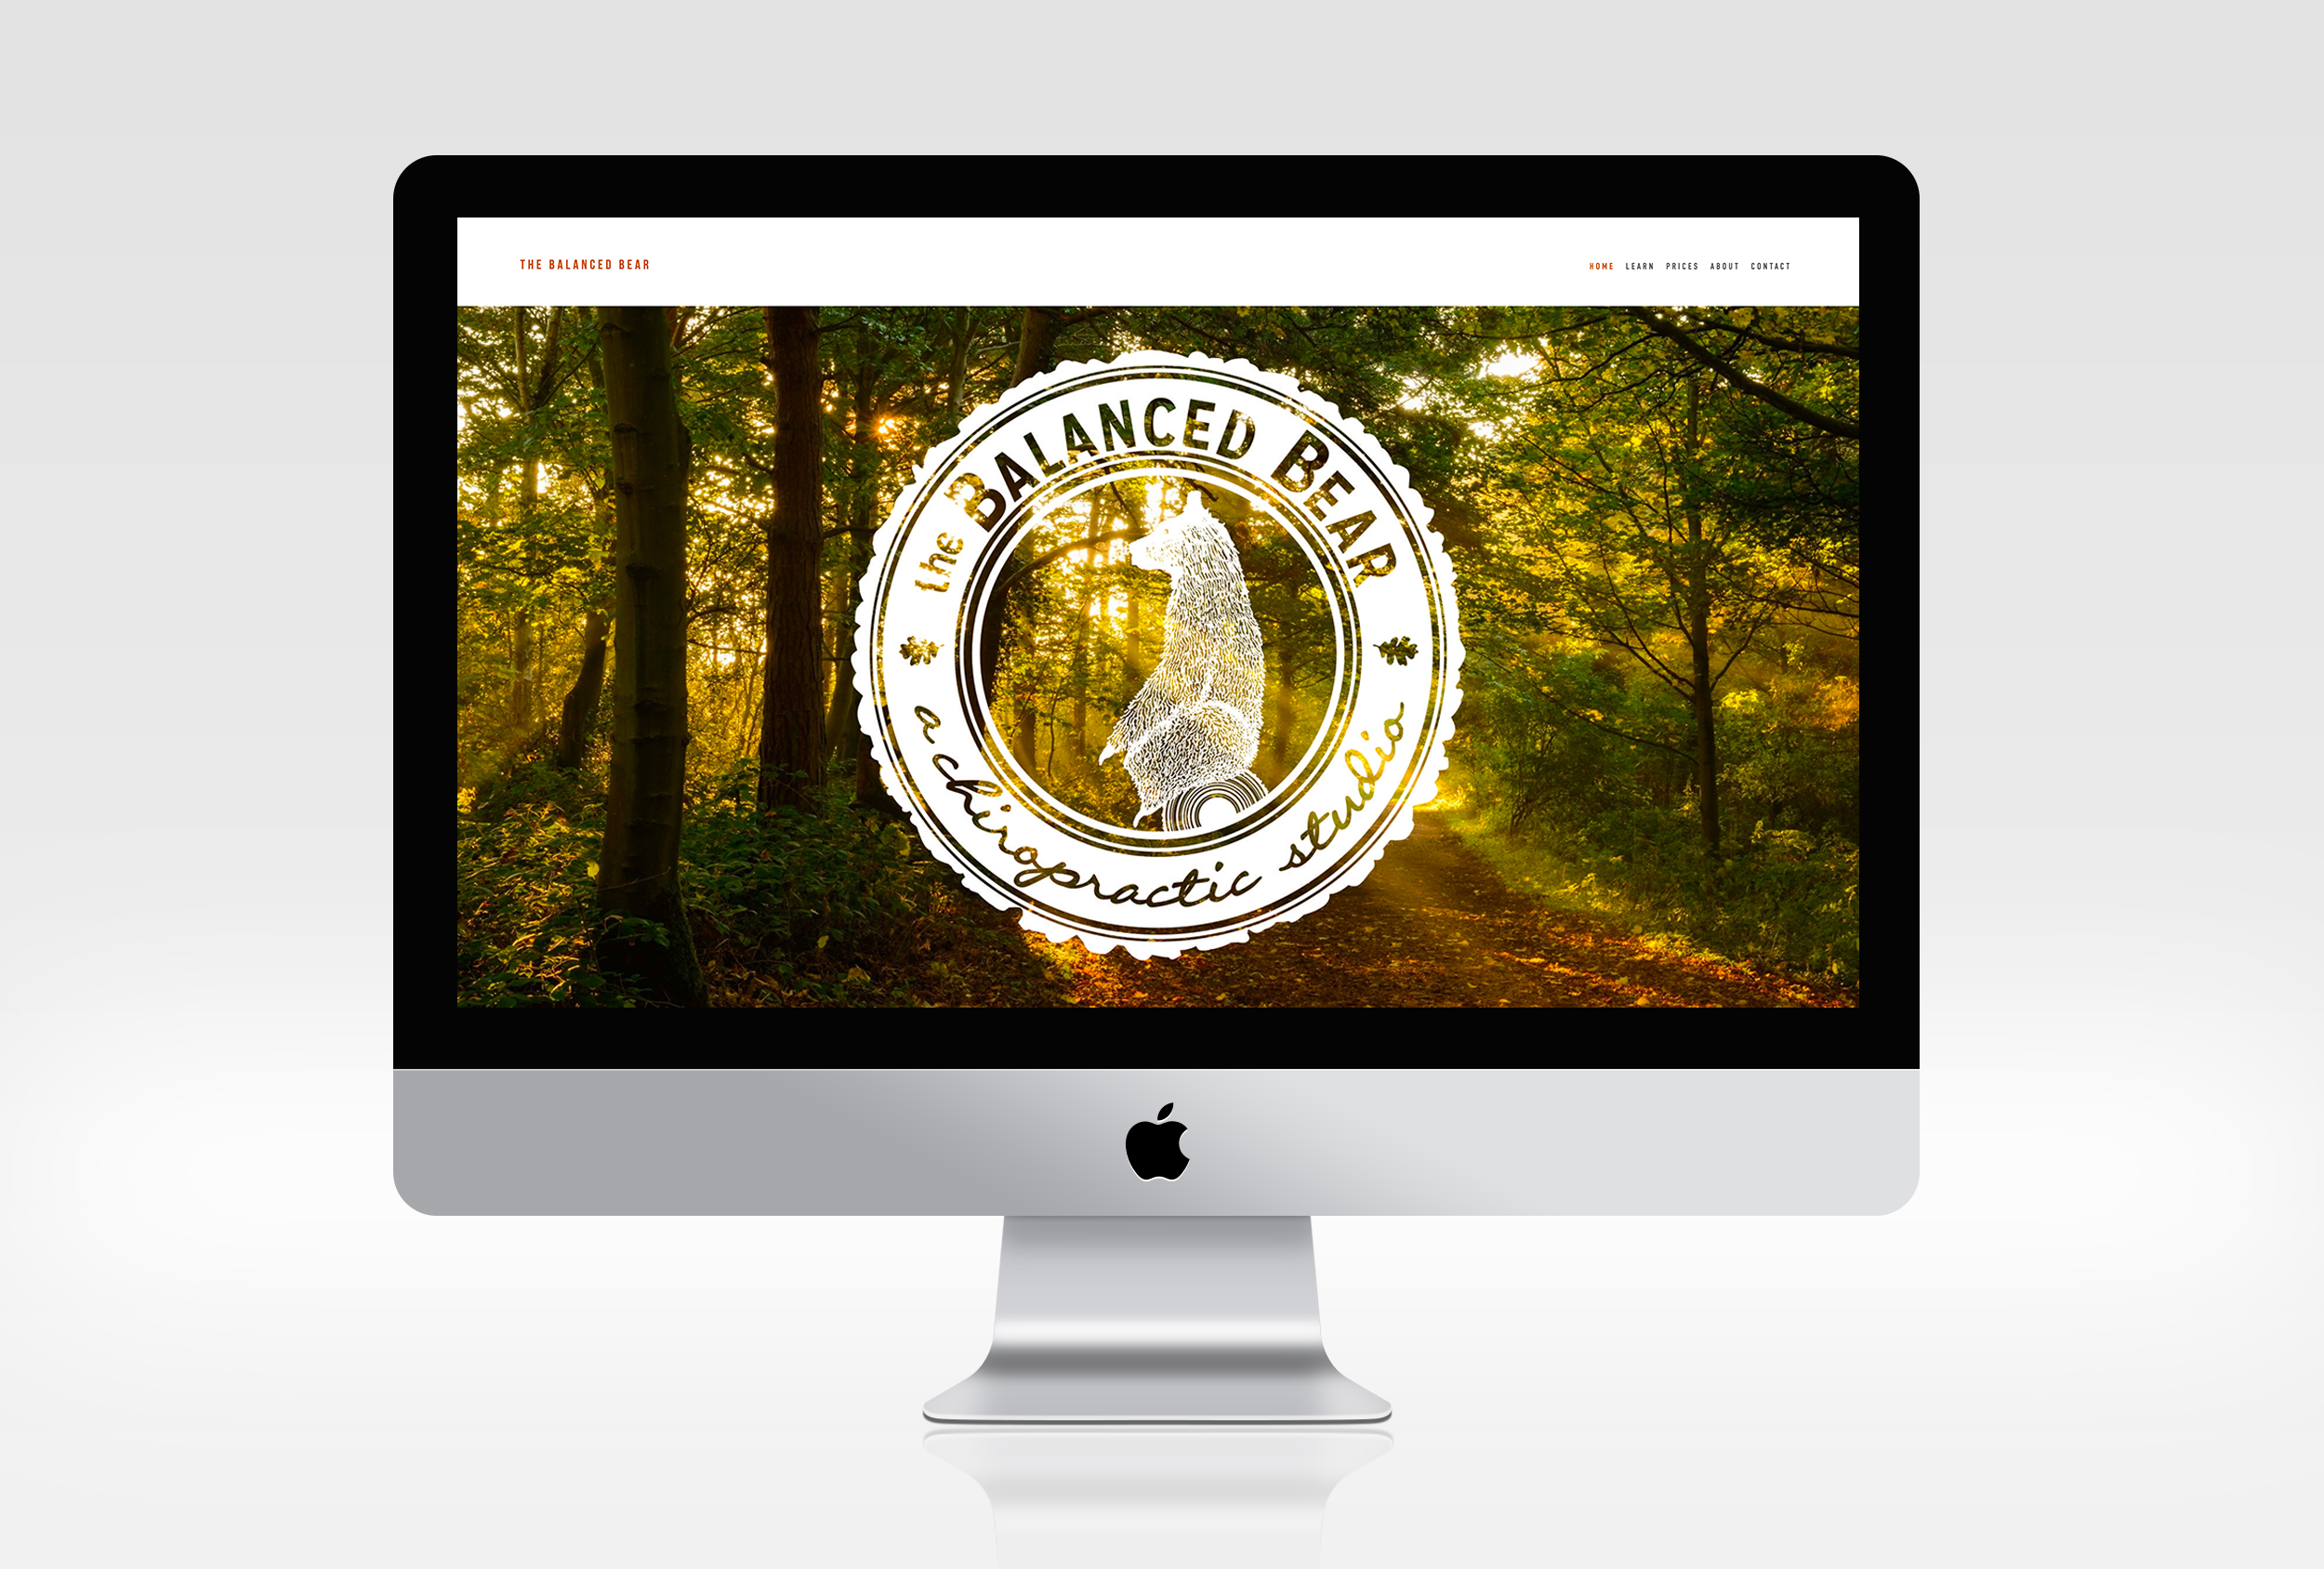 iMac-psd-mockup-template-1.jpg